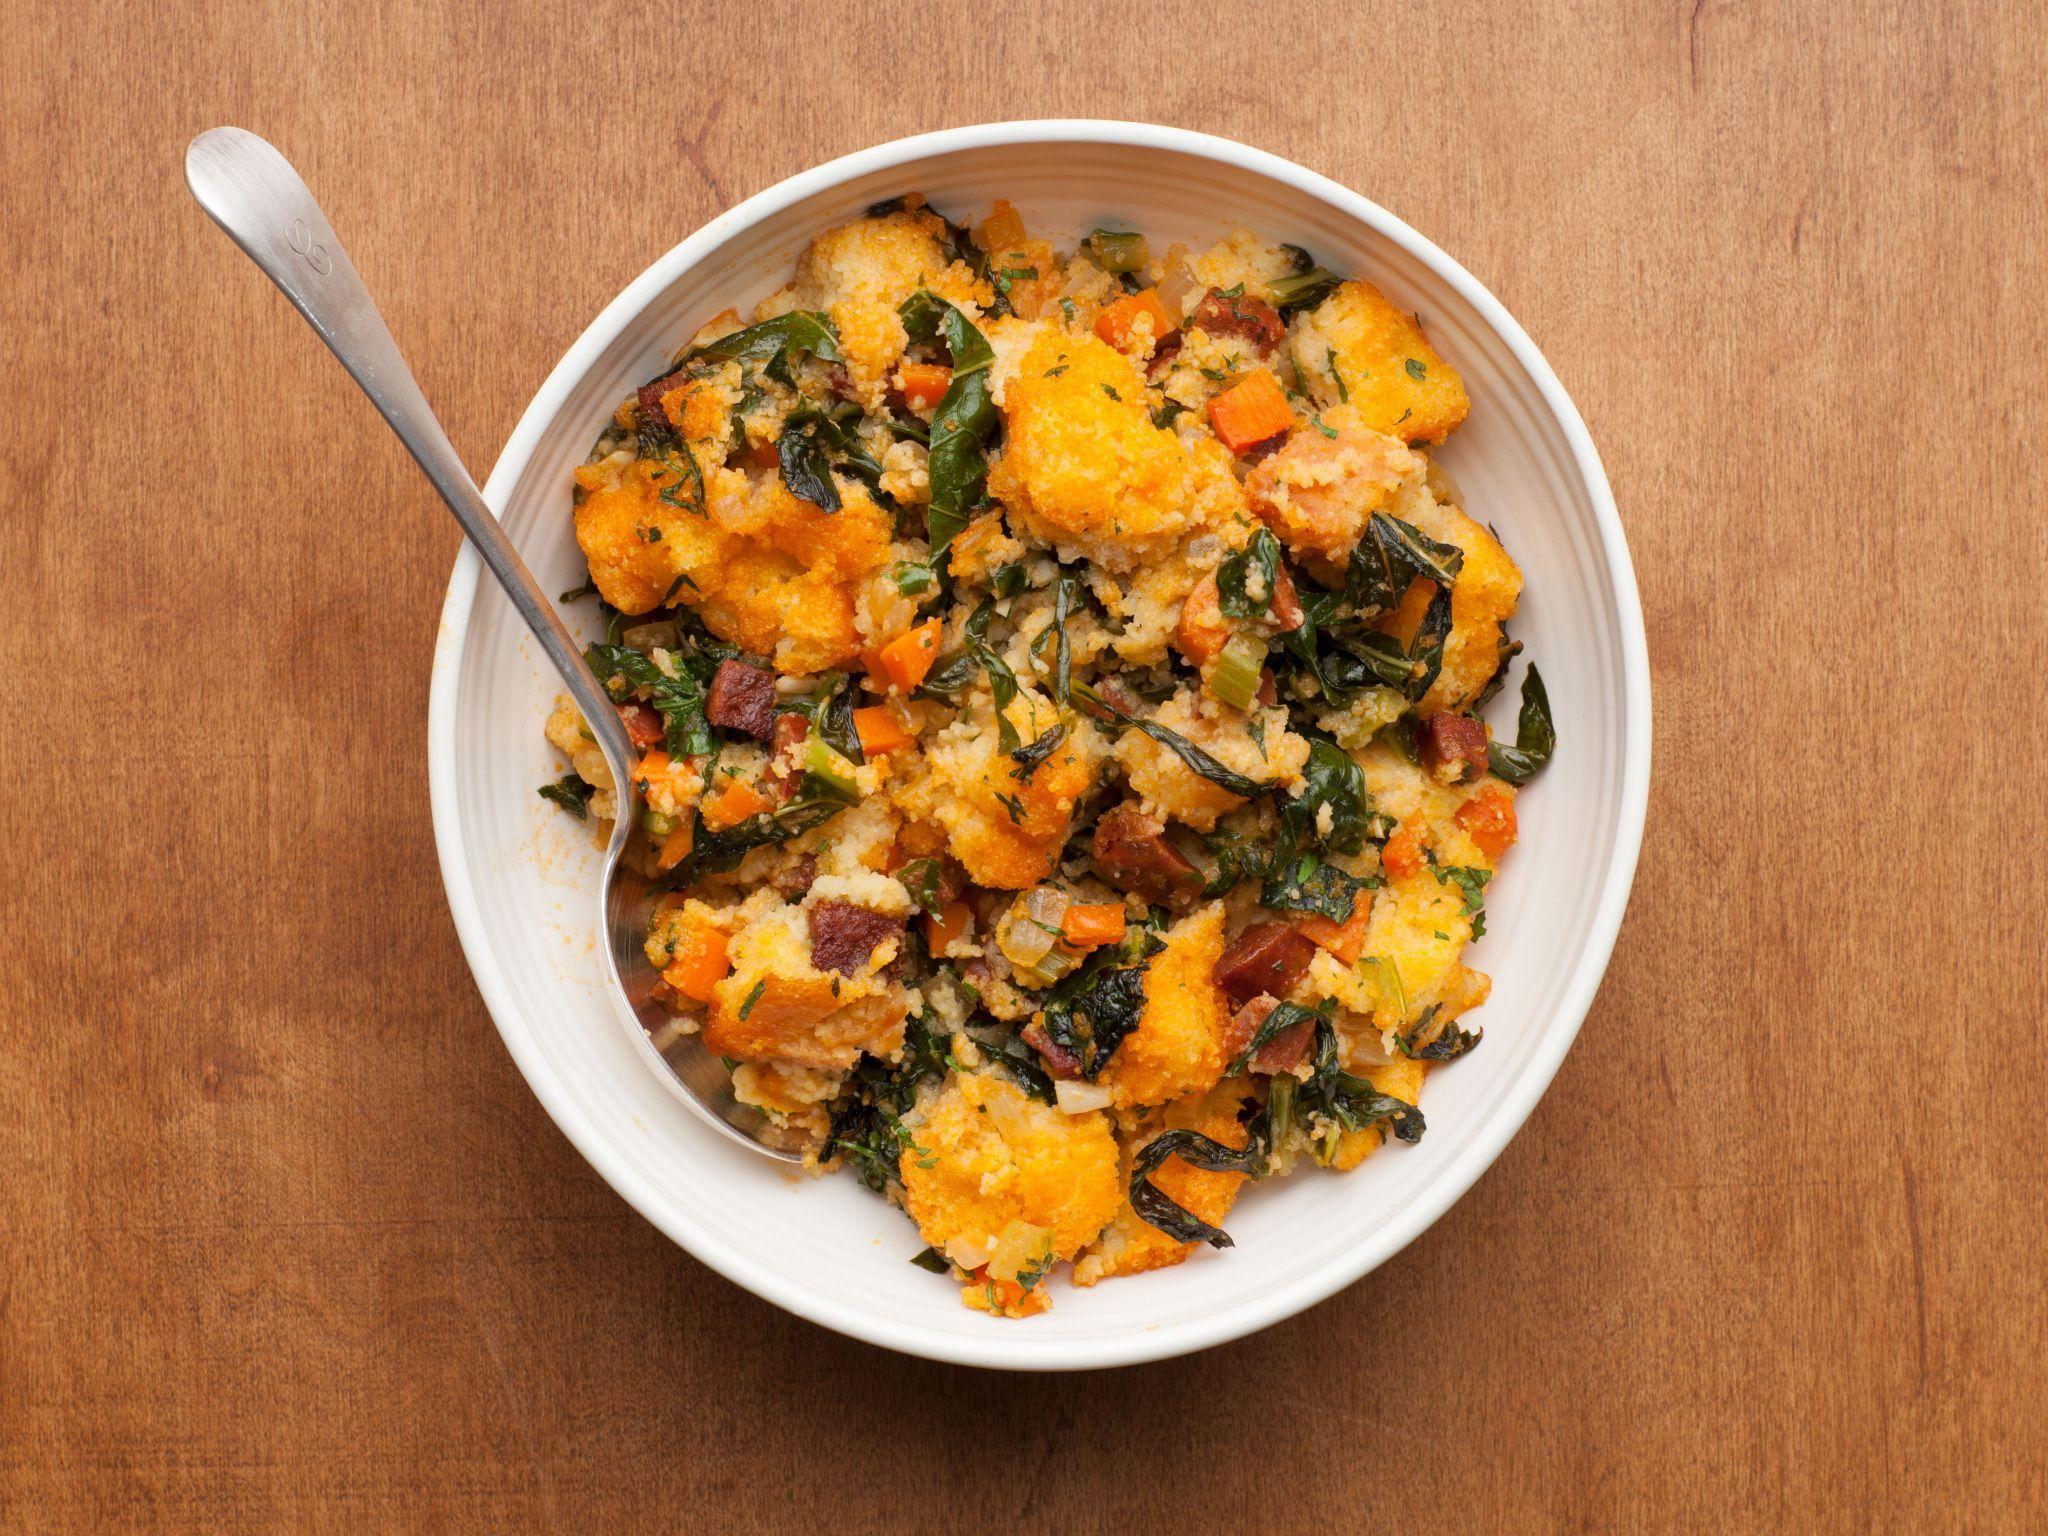 Pats chorizo and collard green dressing recipe collard greens dinner ideas forumfinder Images